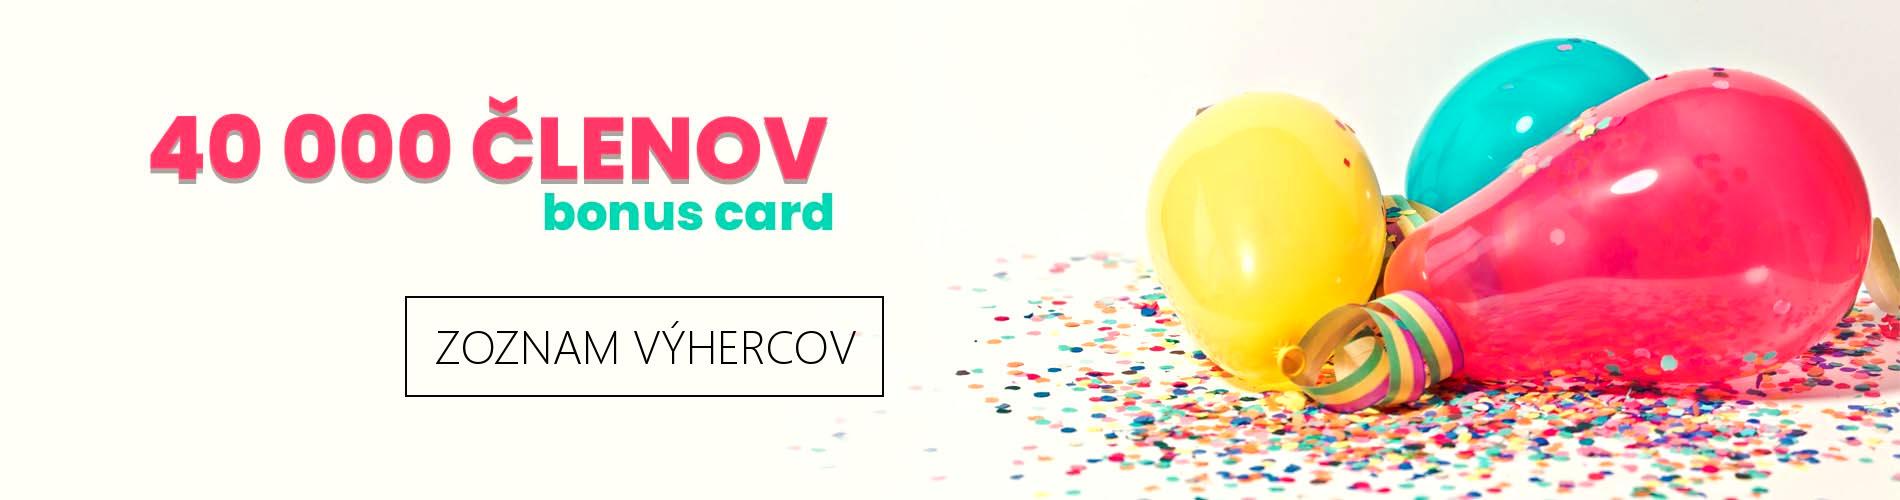 http://www.tevos.sk/wp-content/uploads/2018/09/vyhercovia-1.jpg